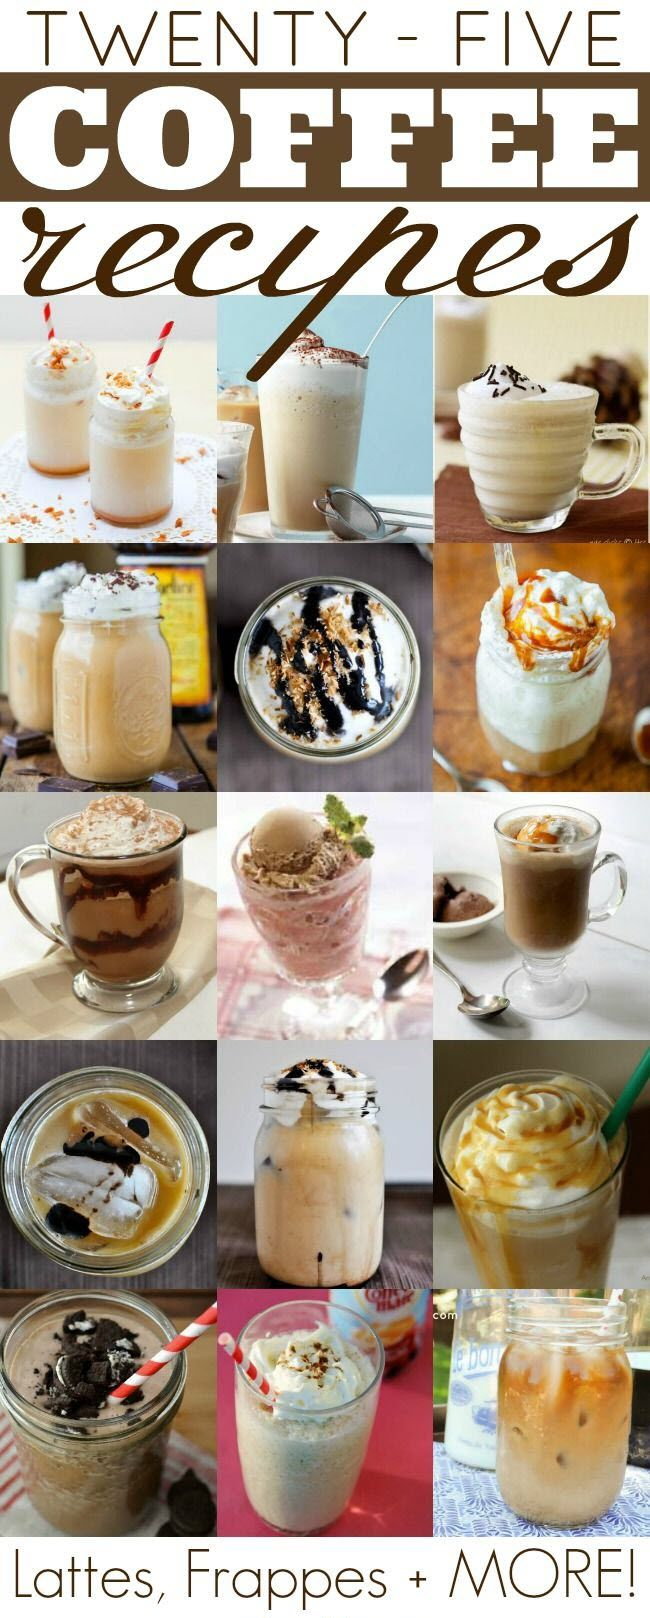 25 Coffee Recipes